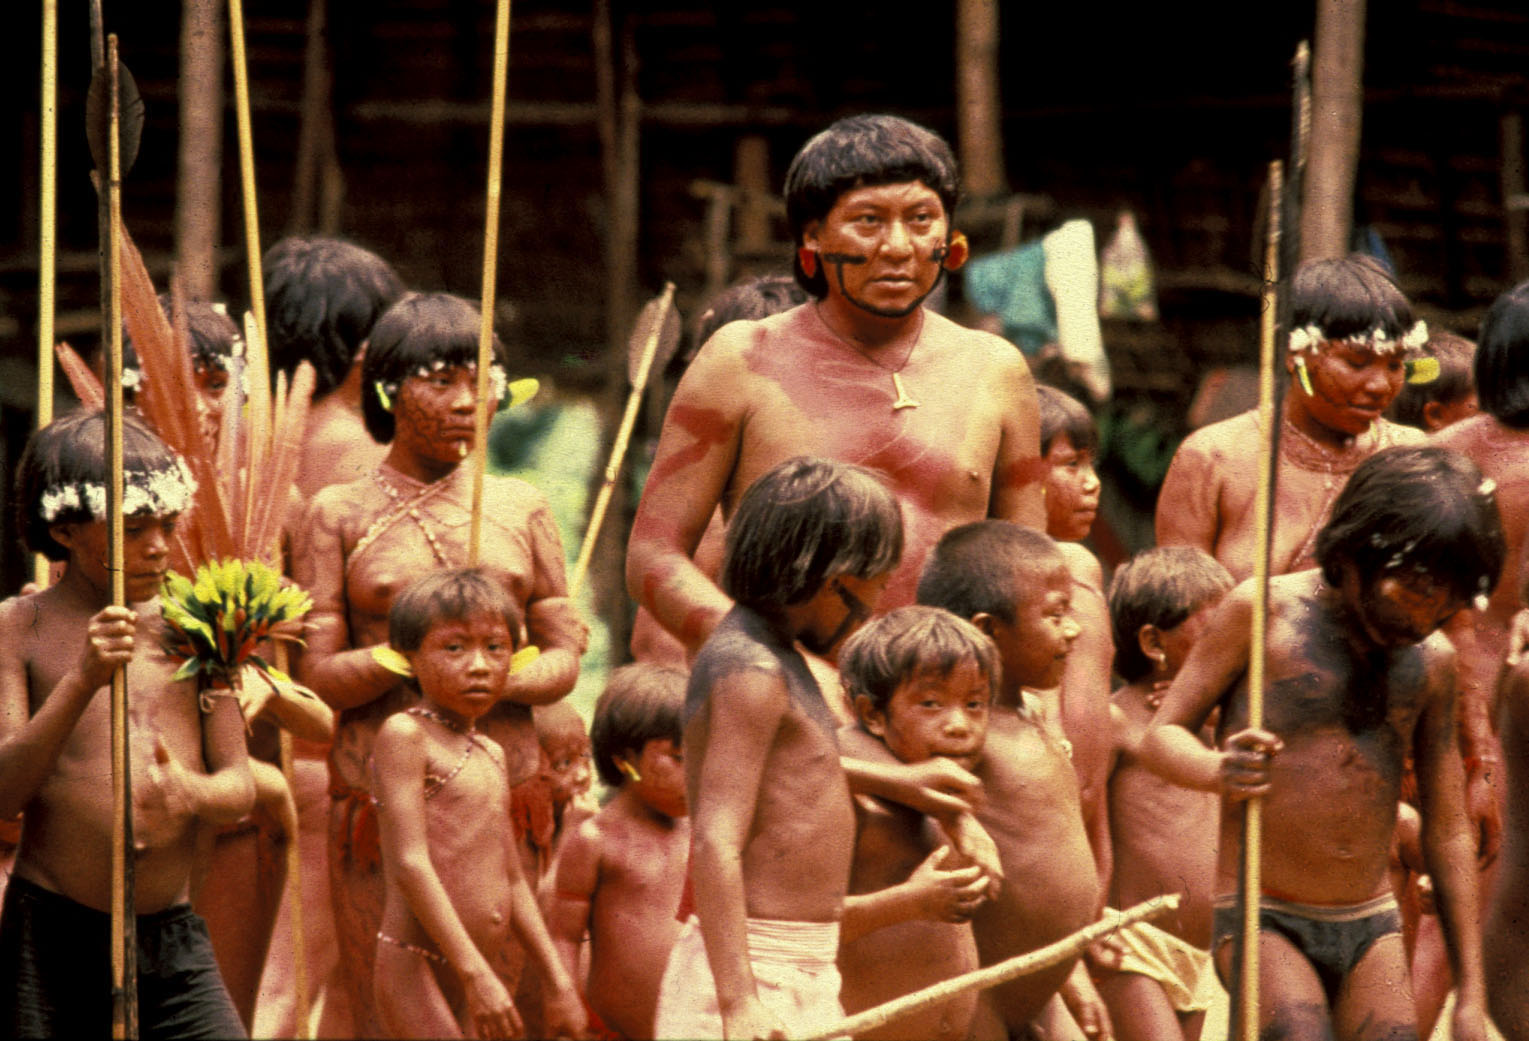 Yanomamis, Grupo Indígena do Norte do Brasil